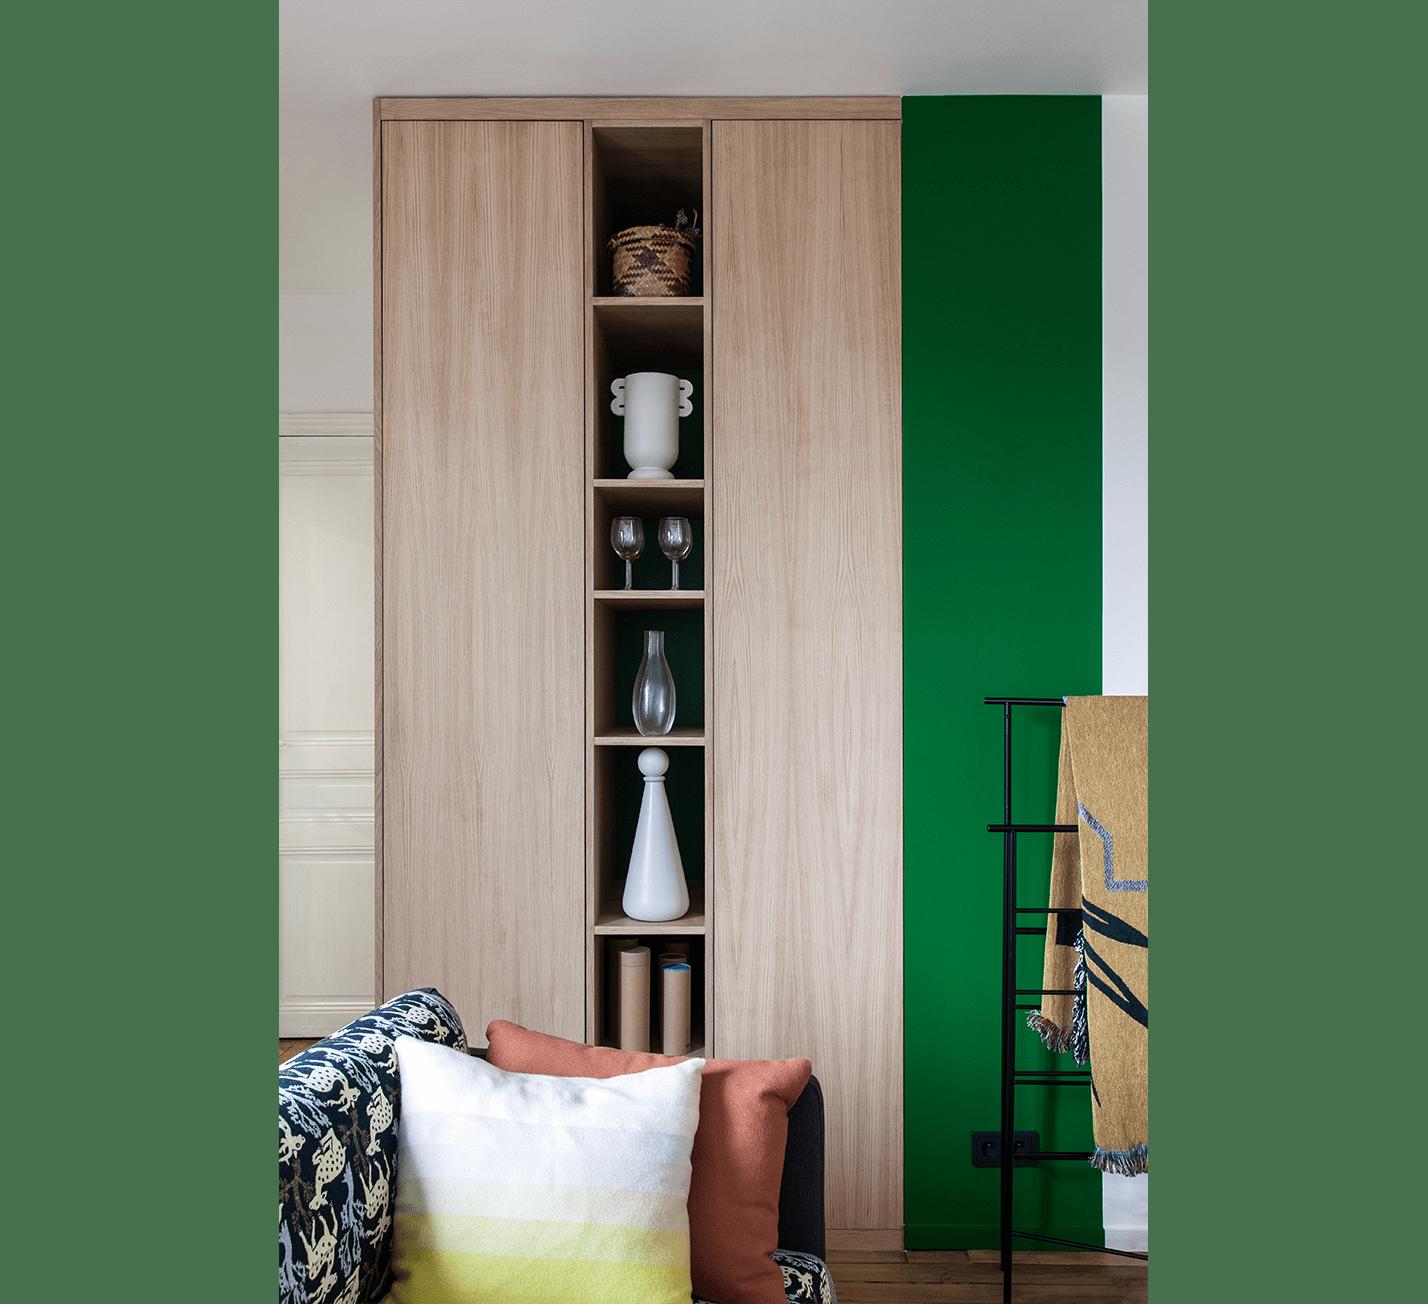 Projet-Cavallotti-Atelier-Steve-Pauline-Borgia-Architecte-interieur-05-min